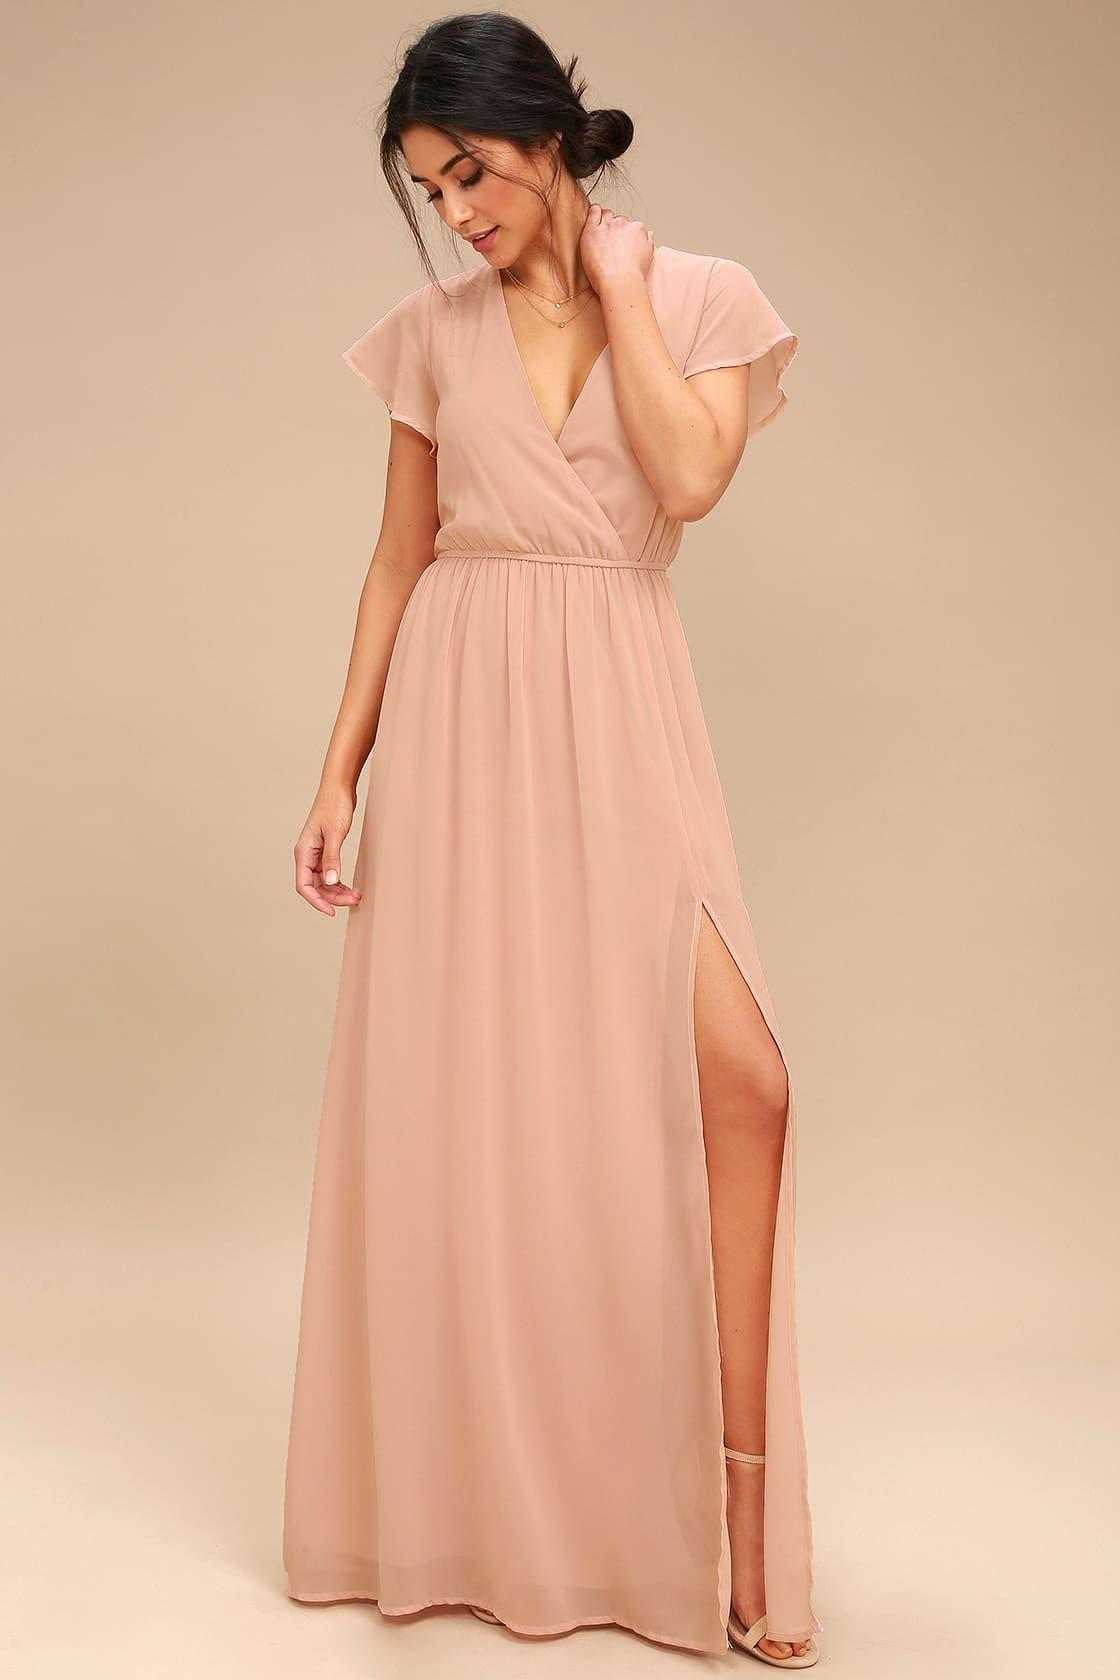 44+ Blush maxi dress ideas in 2021